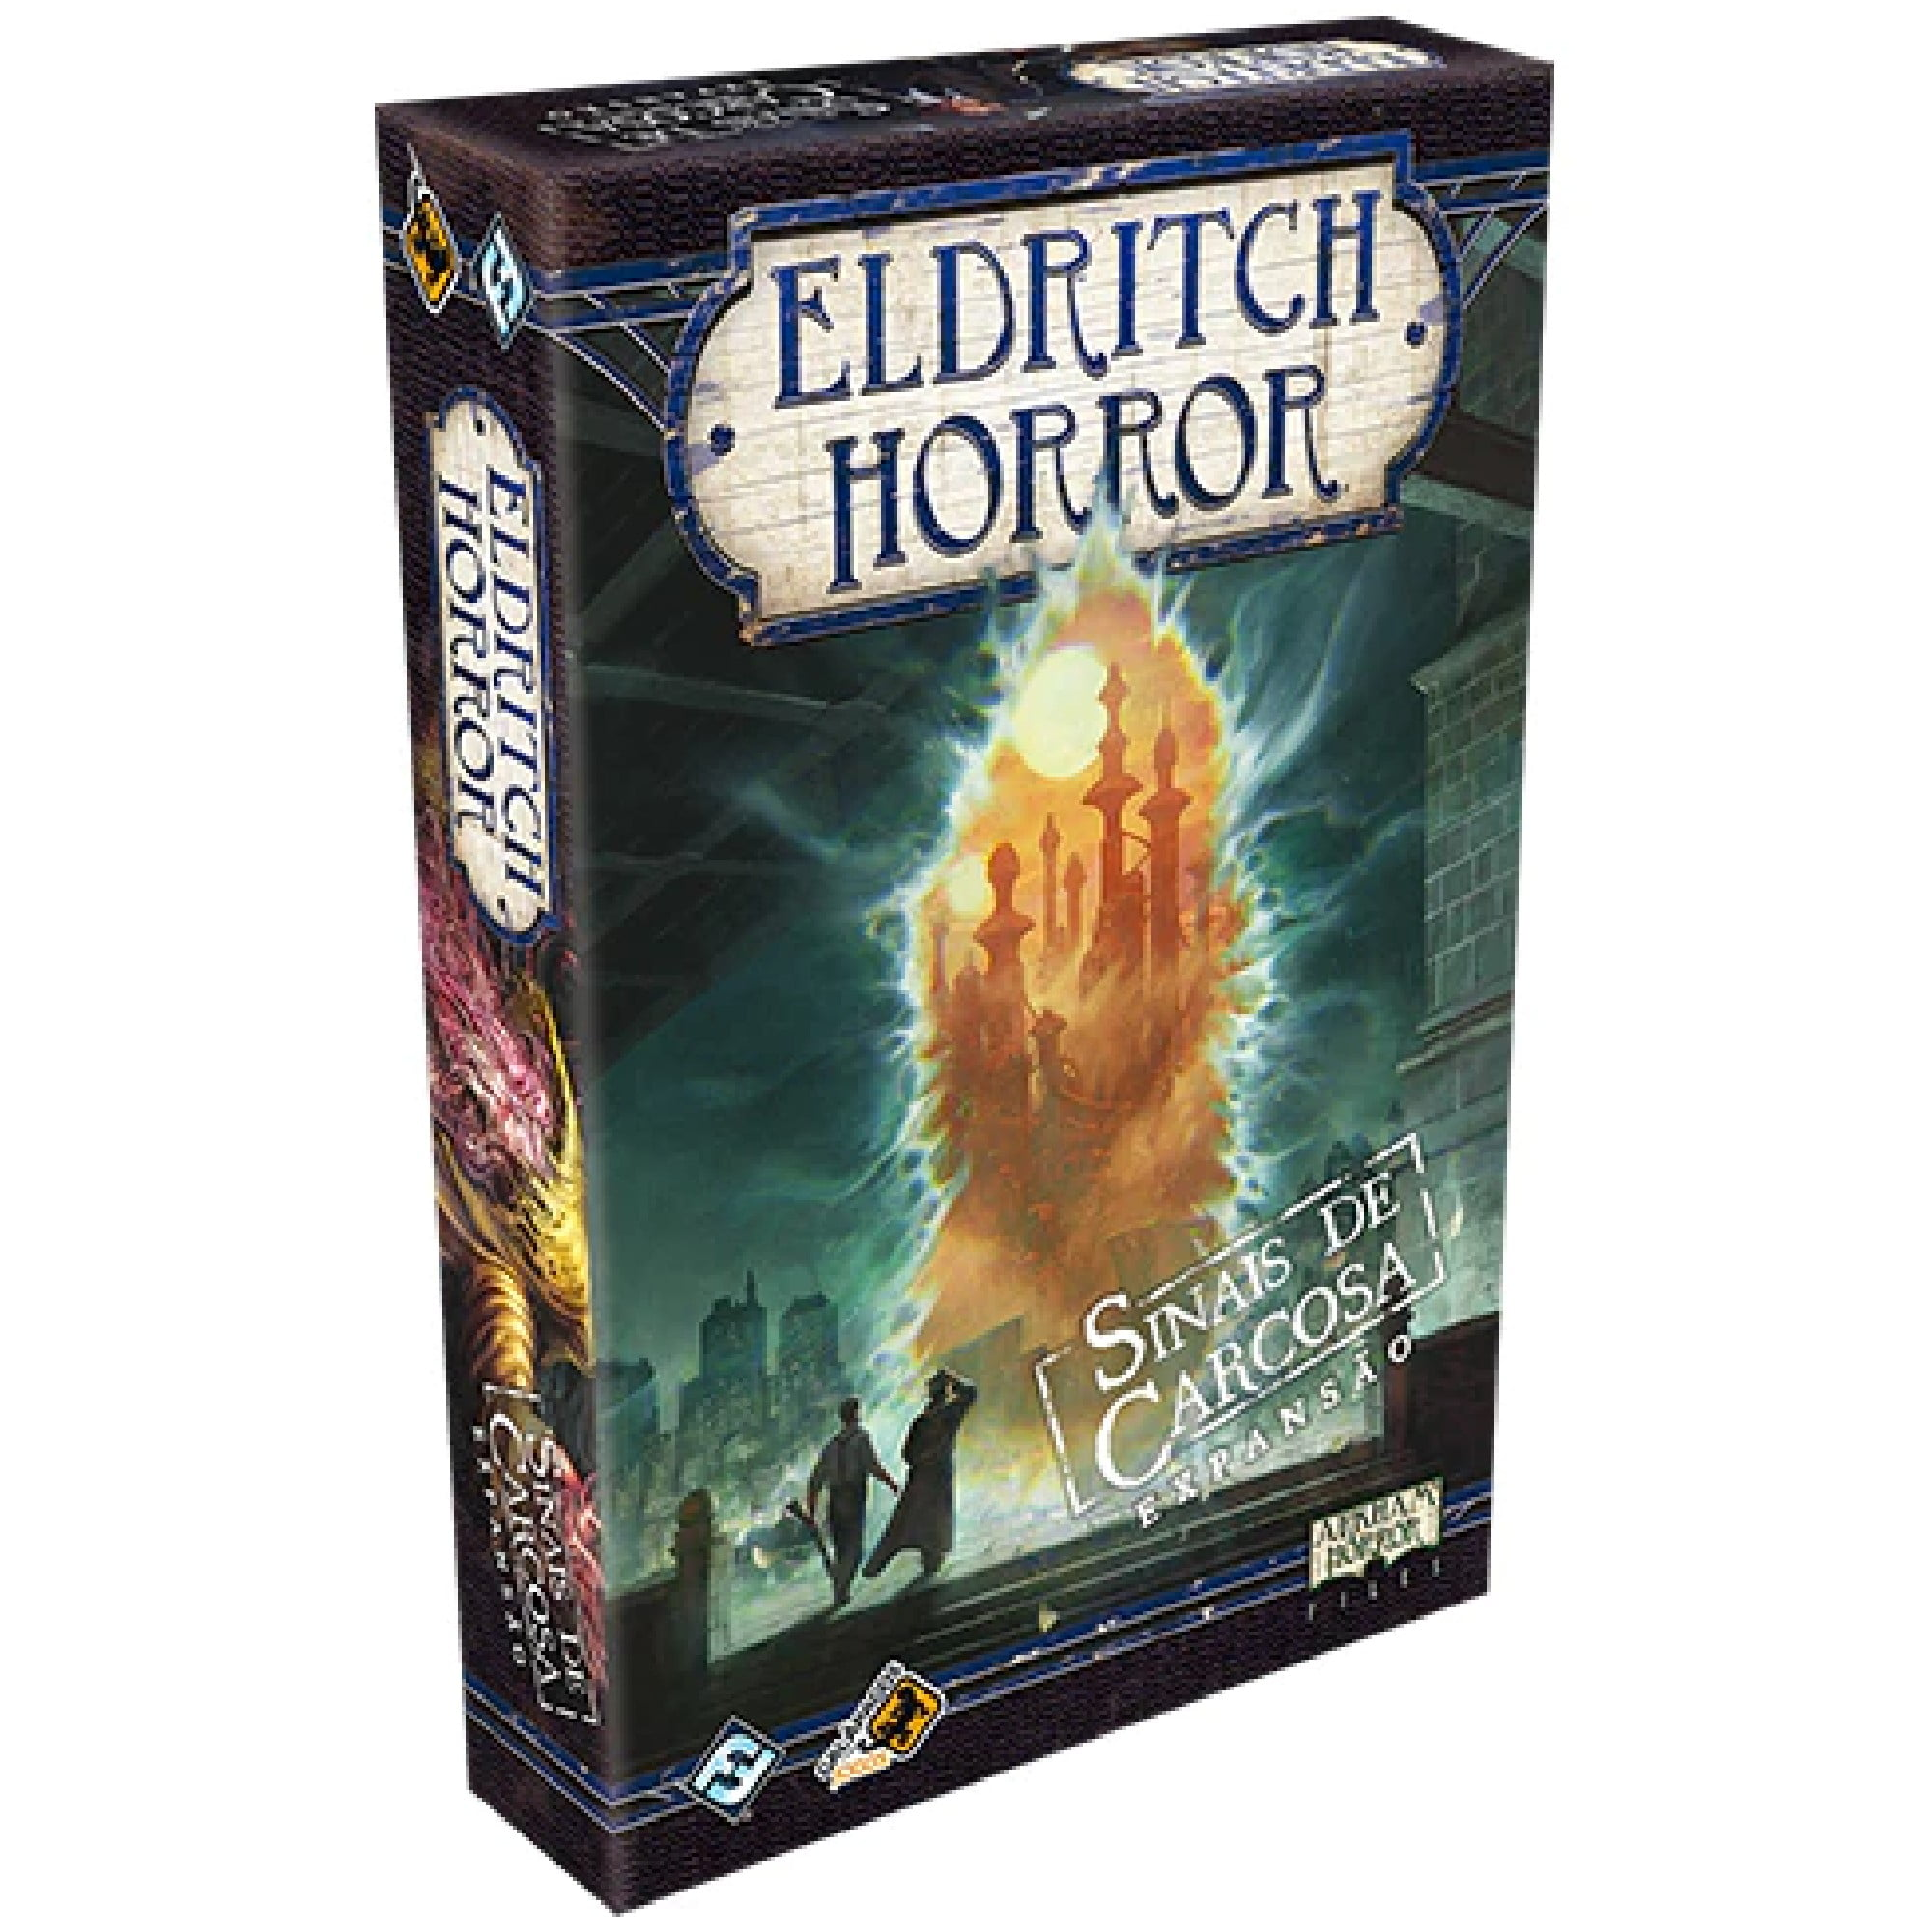 Eldritch Horror- Expansão Sinais de Carcosa